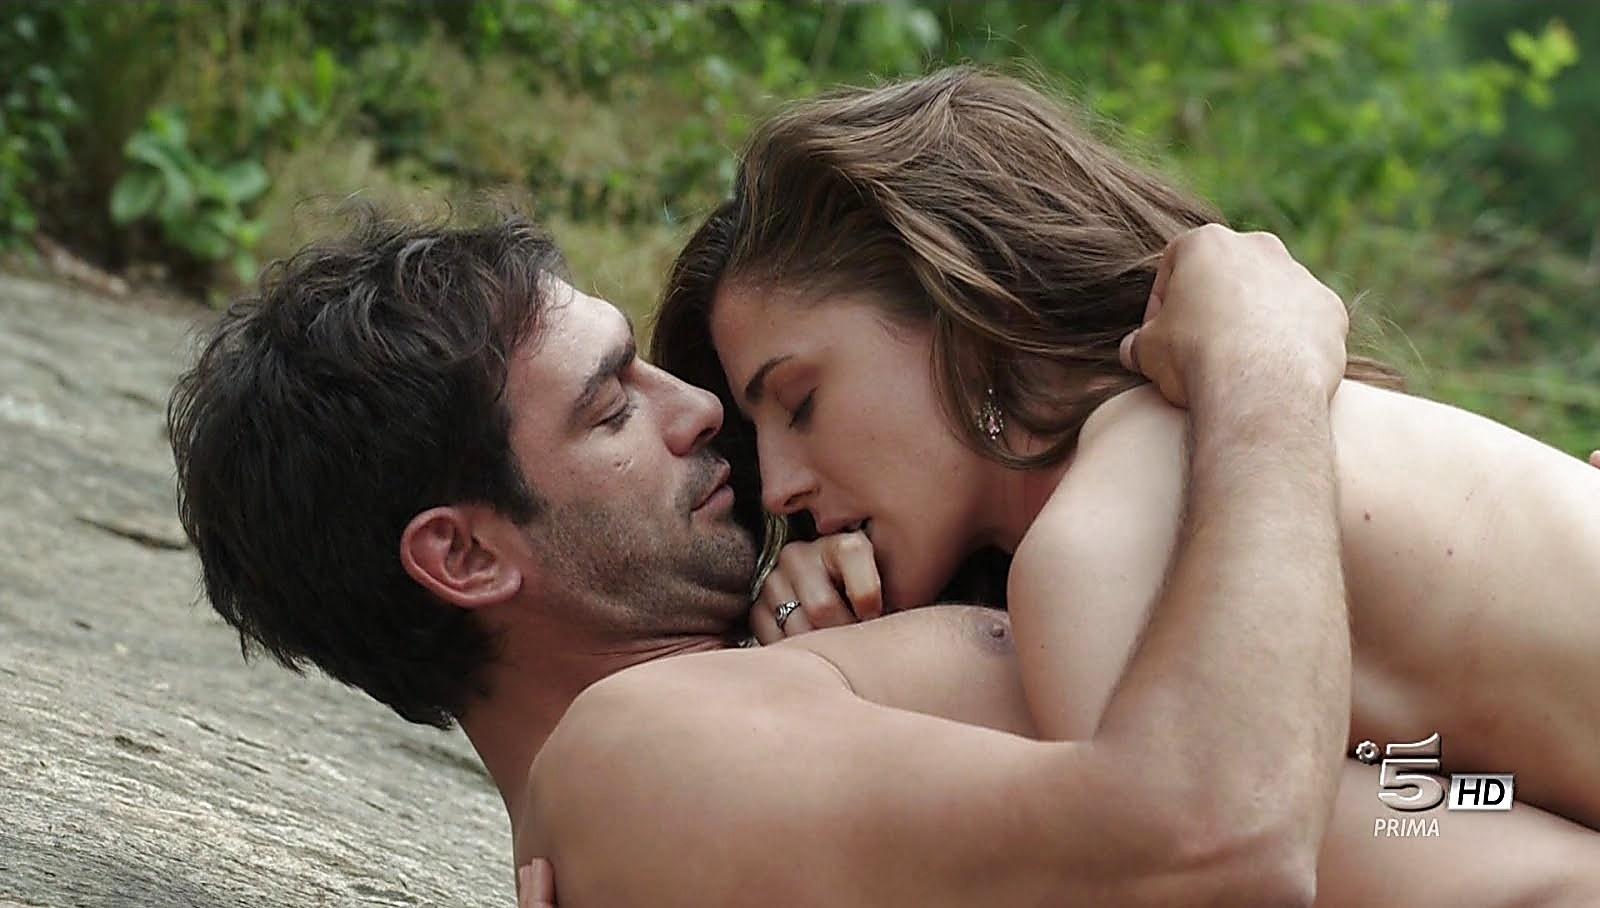 Francesco Arca sexy shirtless scene December 21, 2017, 3pm